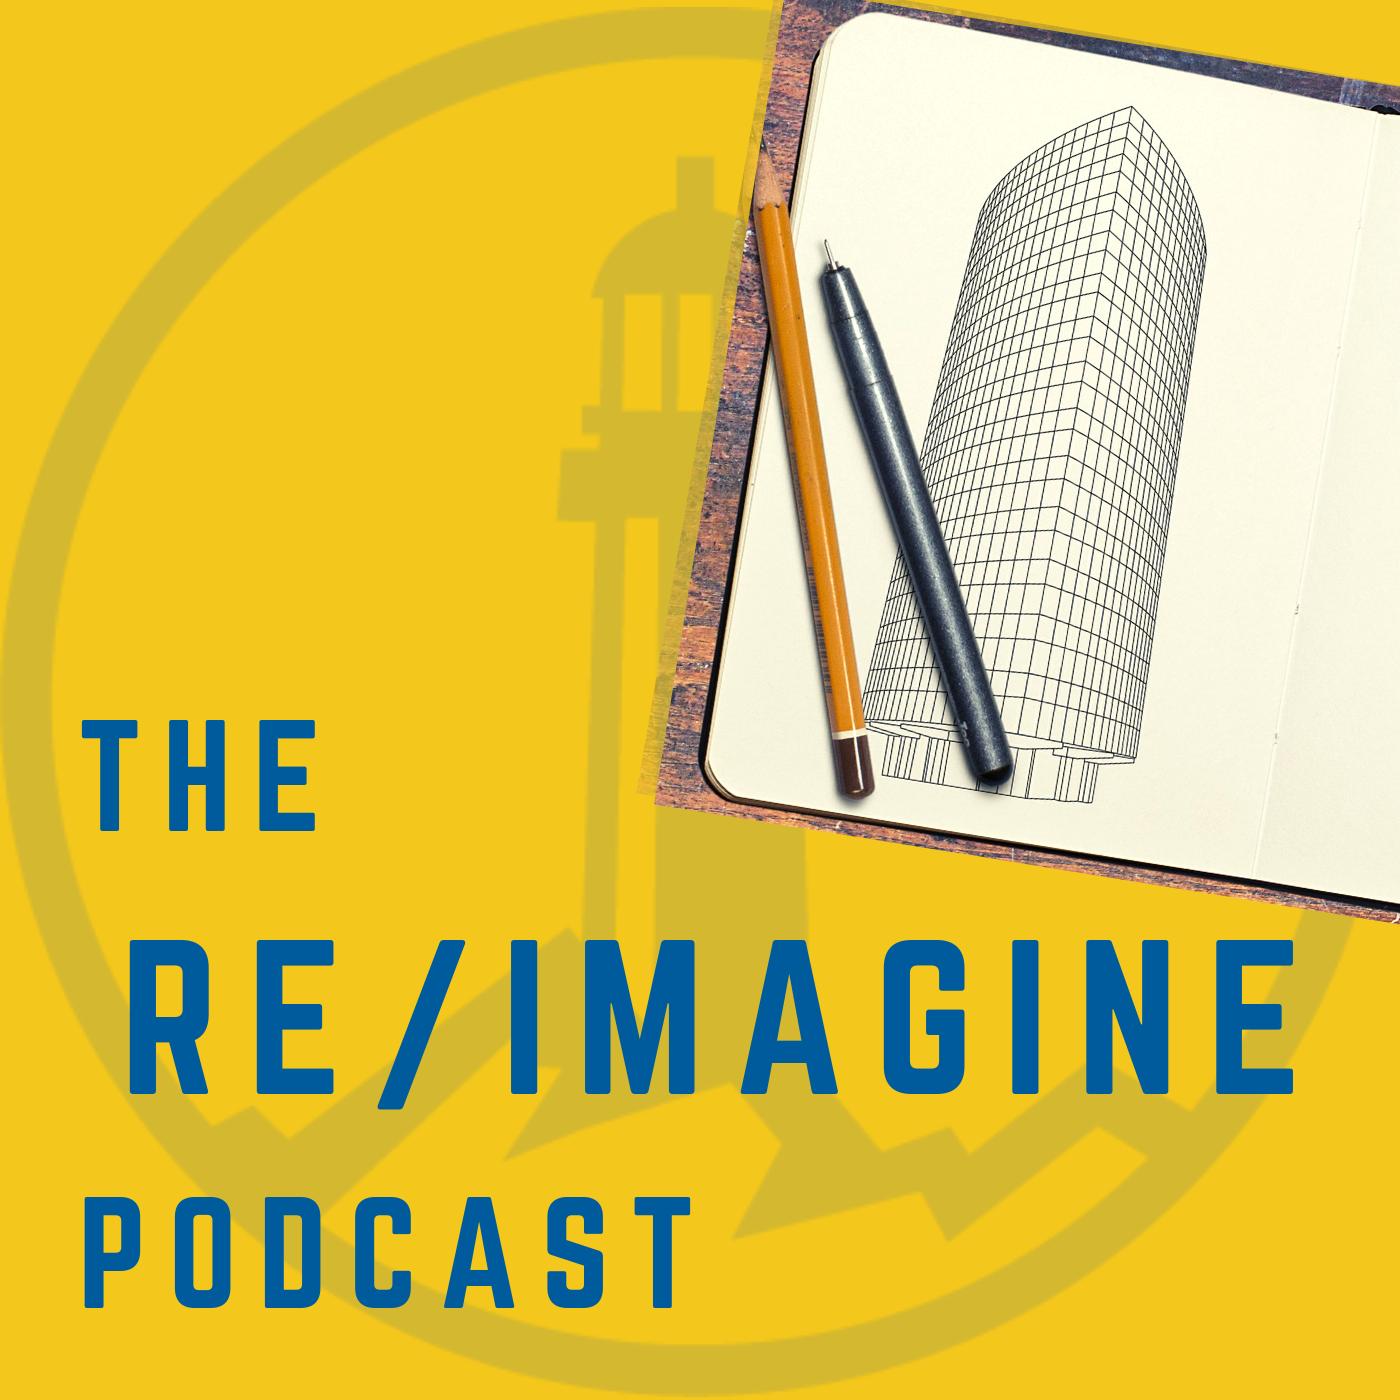 The Re/Imagine Podcast show art